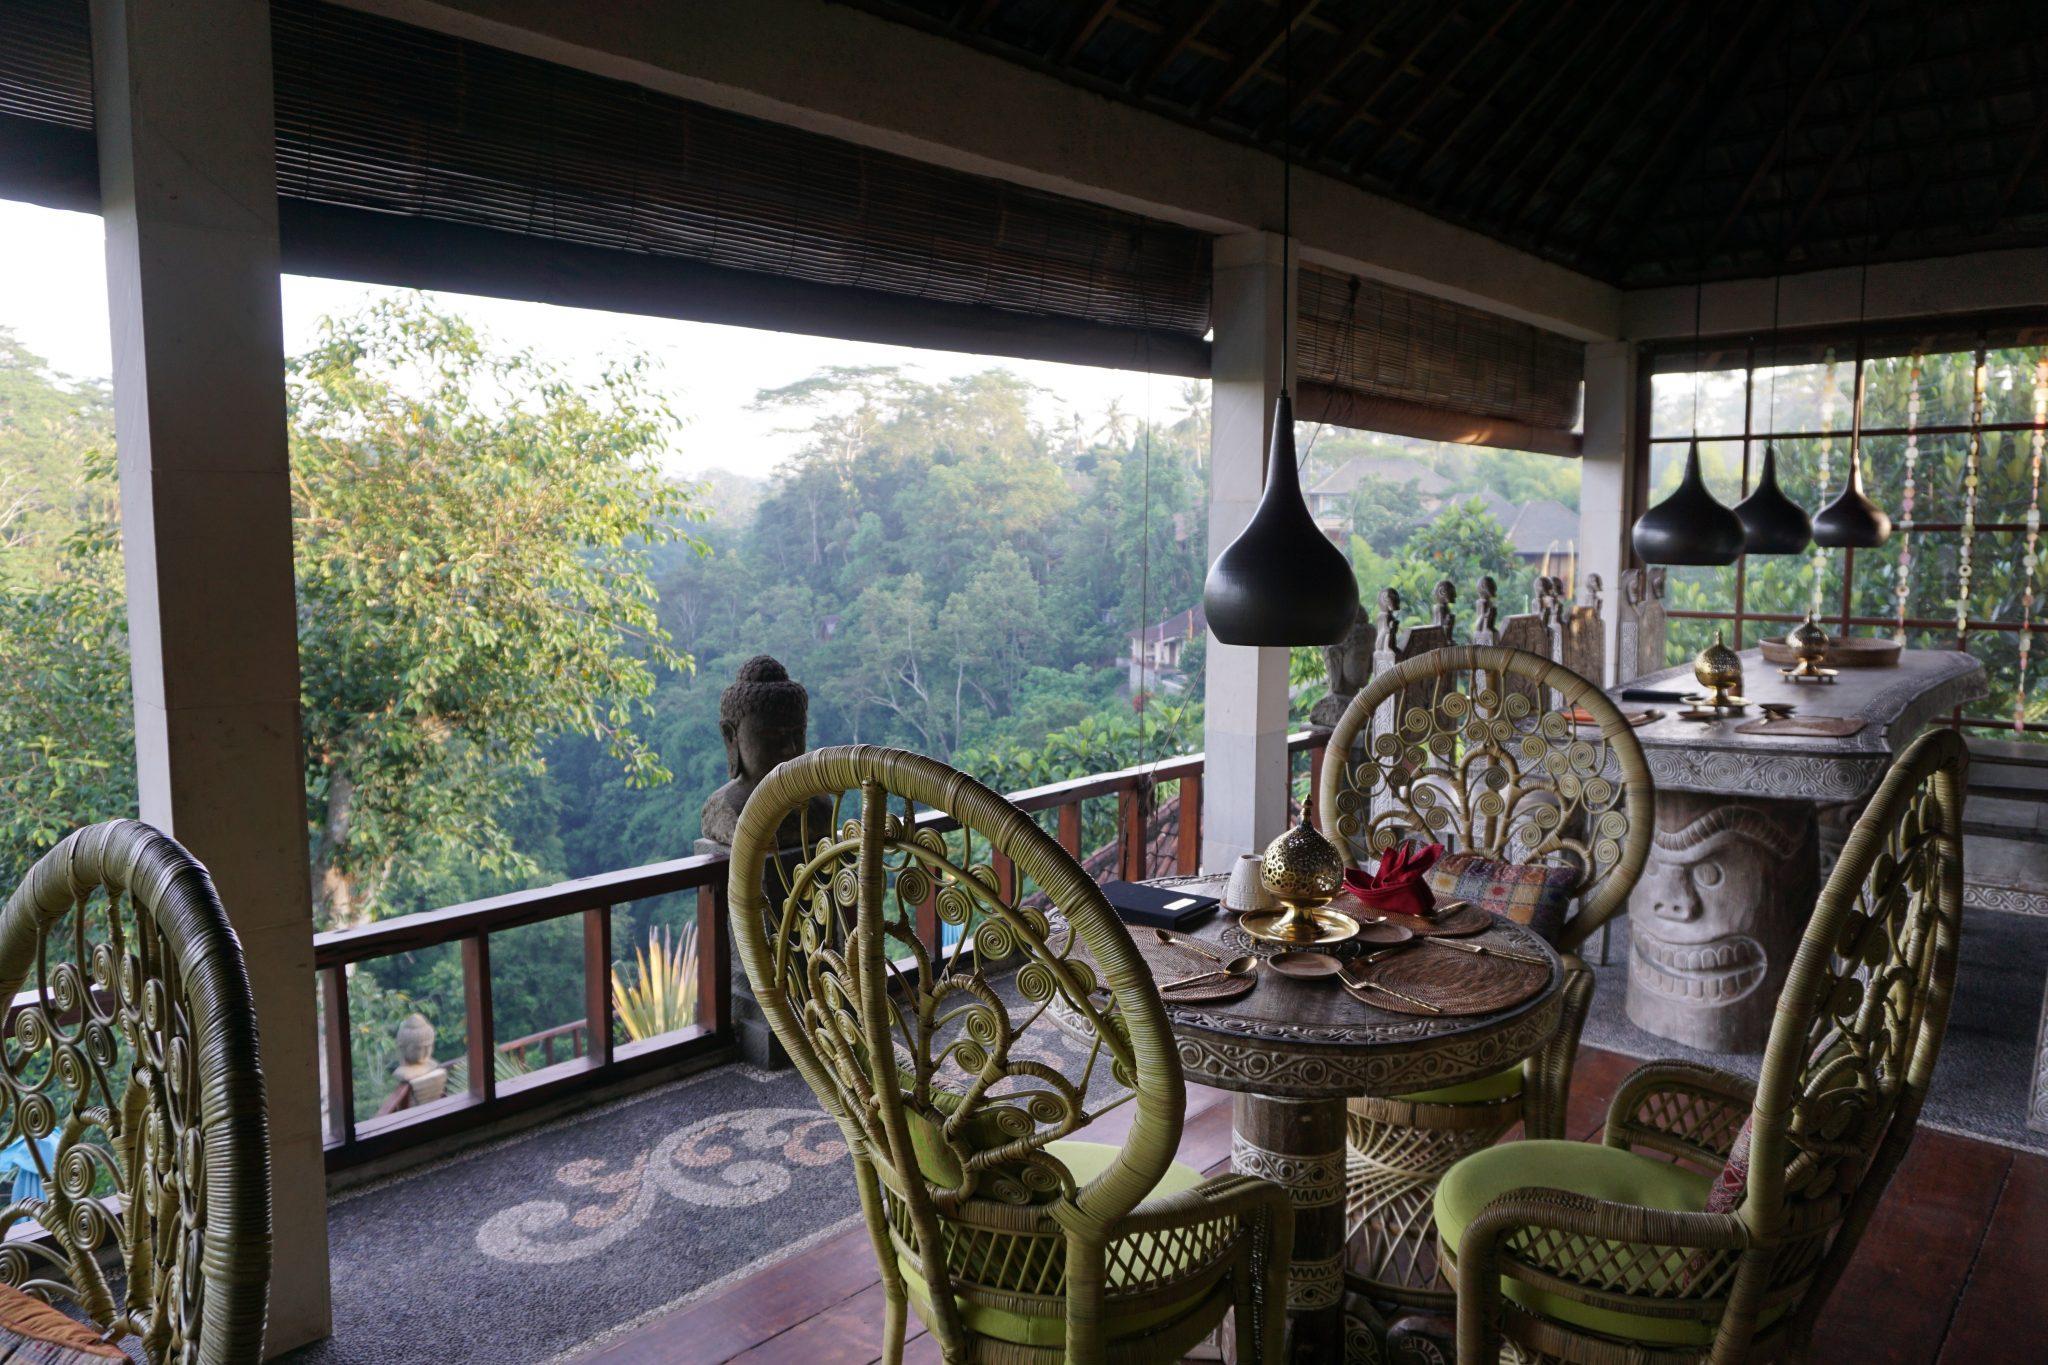 villa kalisat, ubud, bali, indonesia, bali furniture